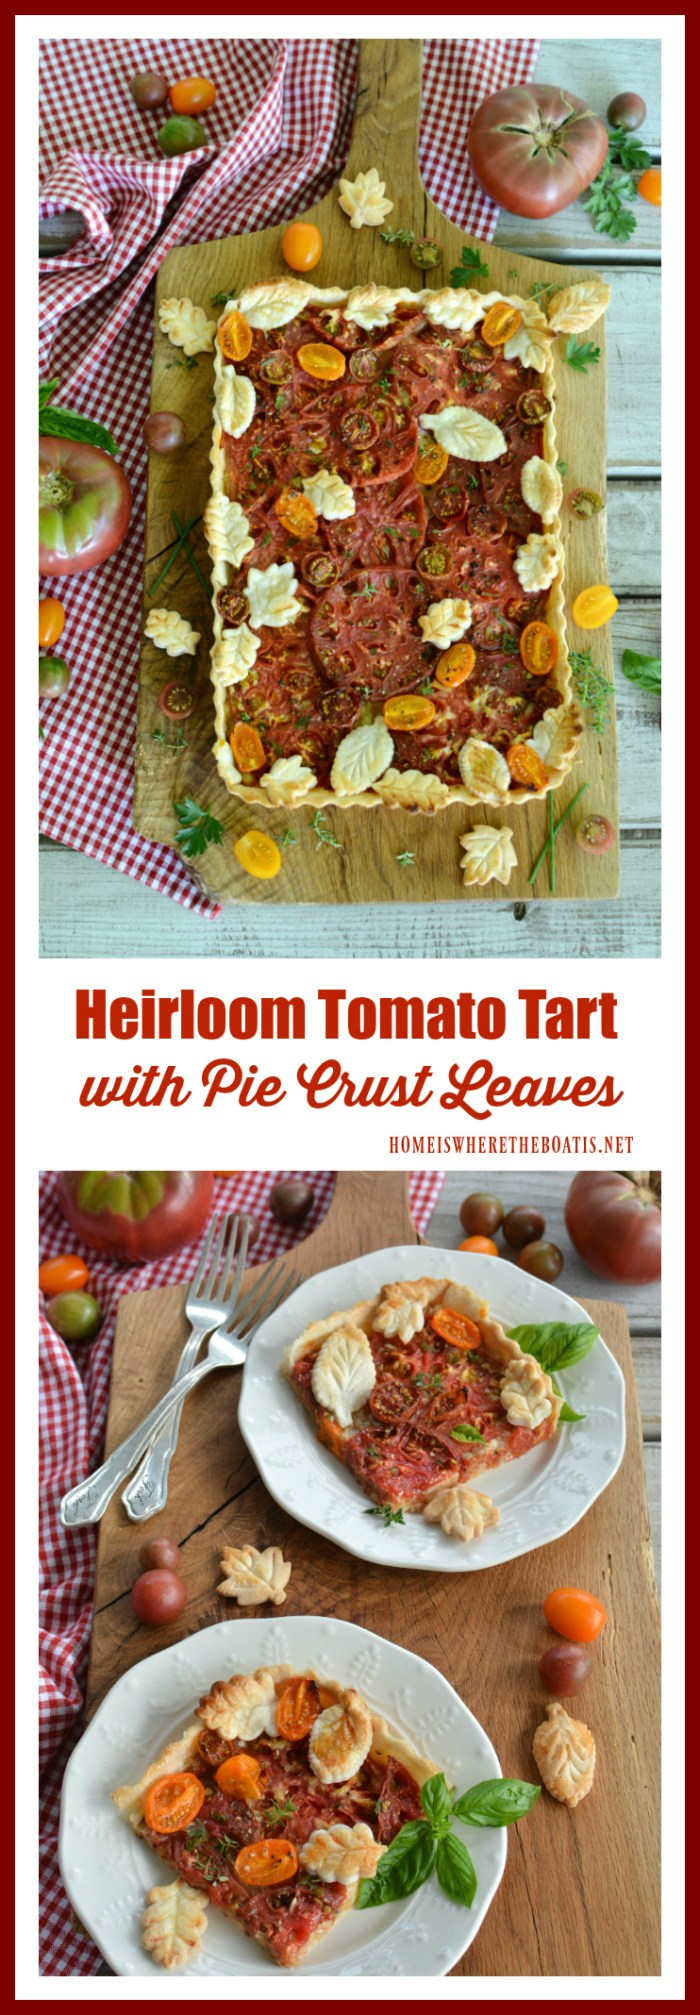 Heirloom Tomato Tart with Pie Crust Leaves